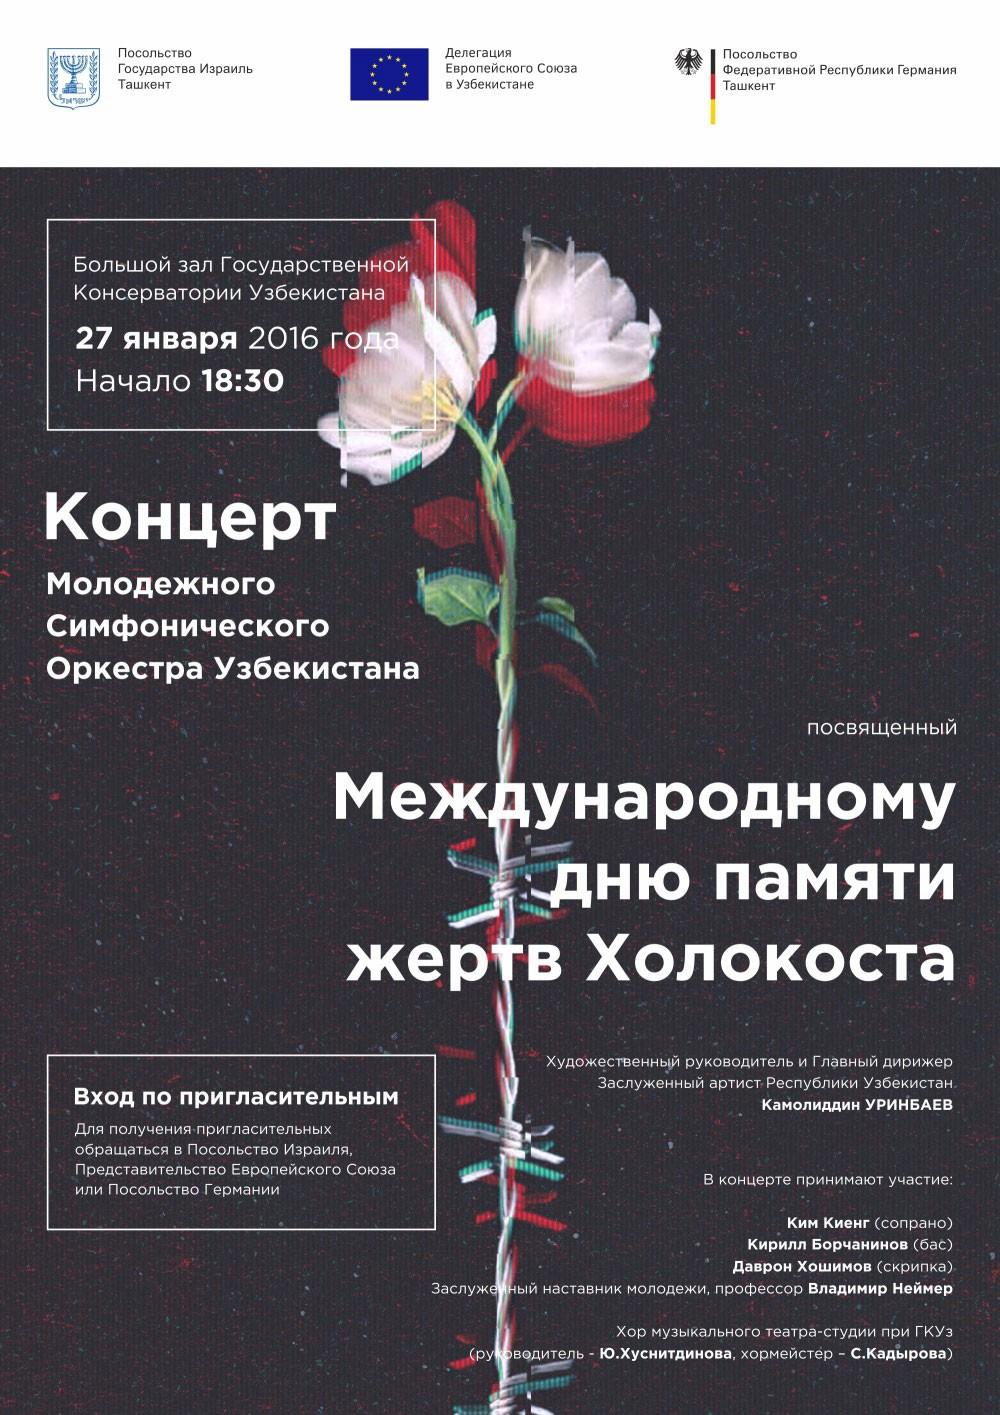 Концерт Памяти Жертв Холокоста в Ташкенте